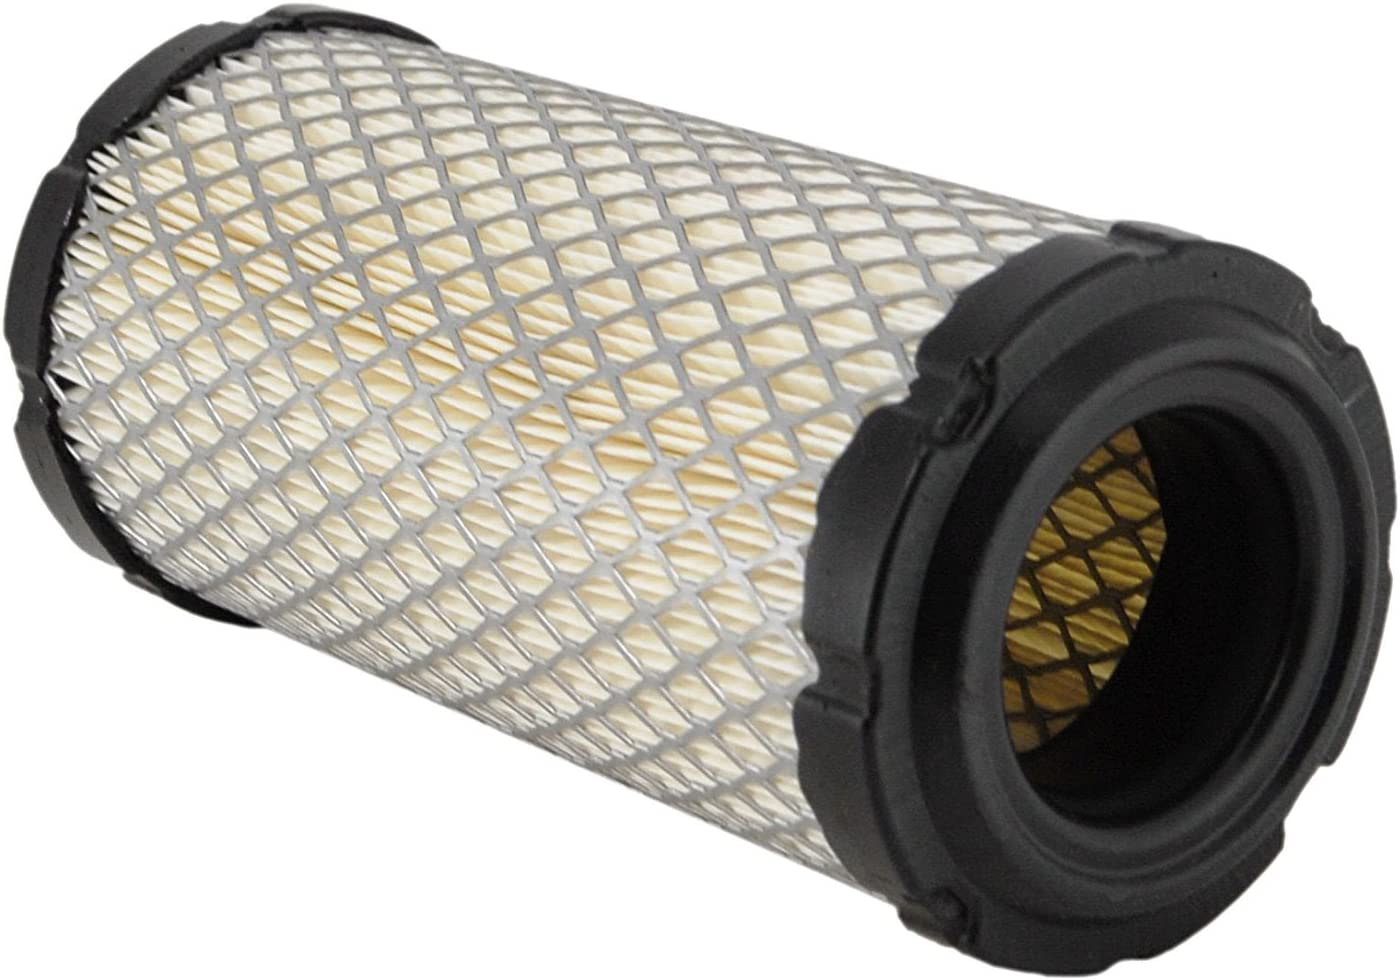 Filter, Air Clean - K1211-82320